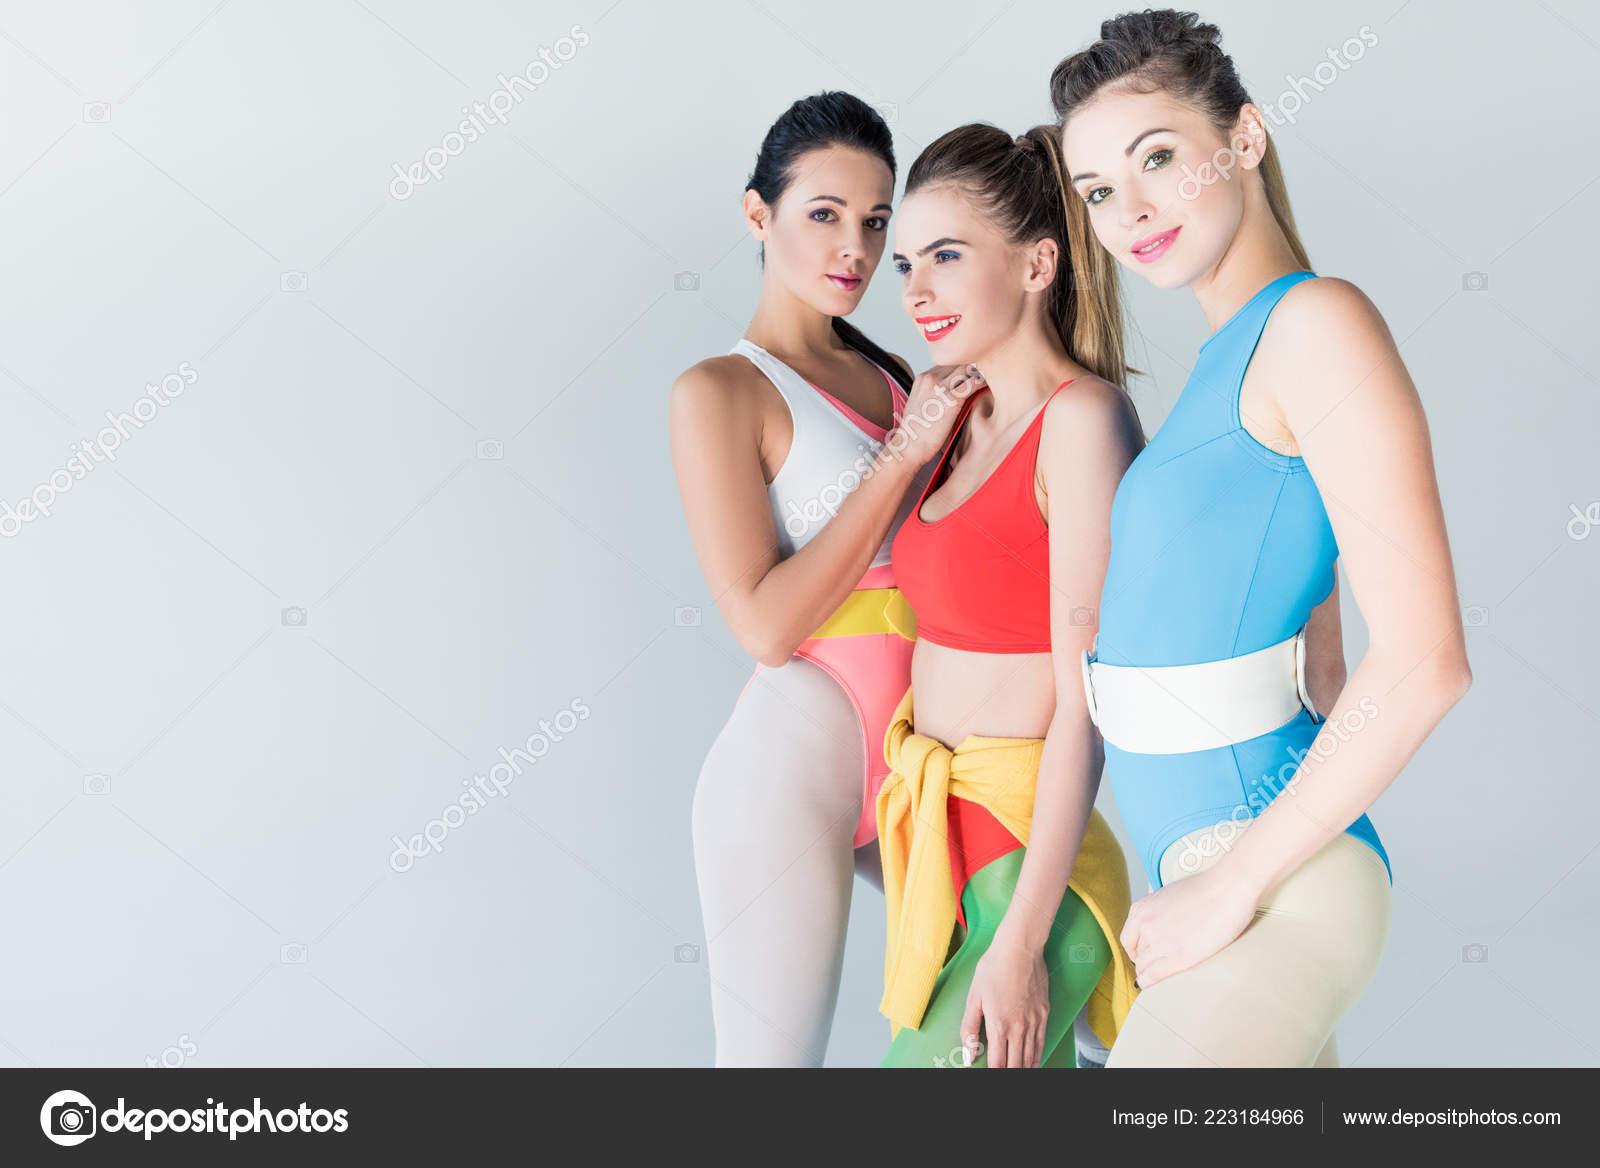 Girls in bodysuits pics Beautiful Sporty Girls Bodysuits Standing Together Isolated Grey Stock Photo By C Edzbarzhyvetsky 223184966